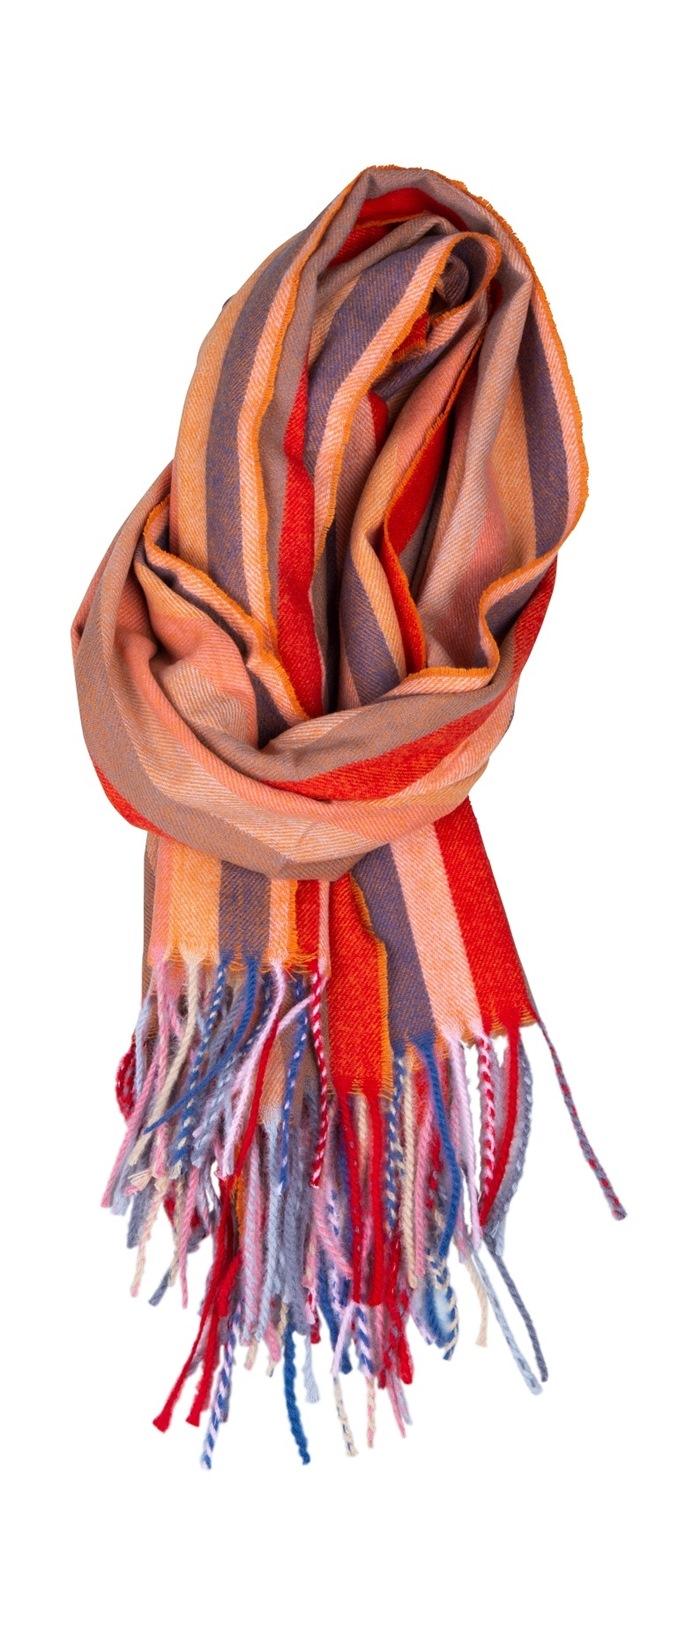 Tørklæde, kraftigt m/Stribe, Orange (01005-5)